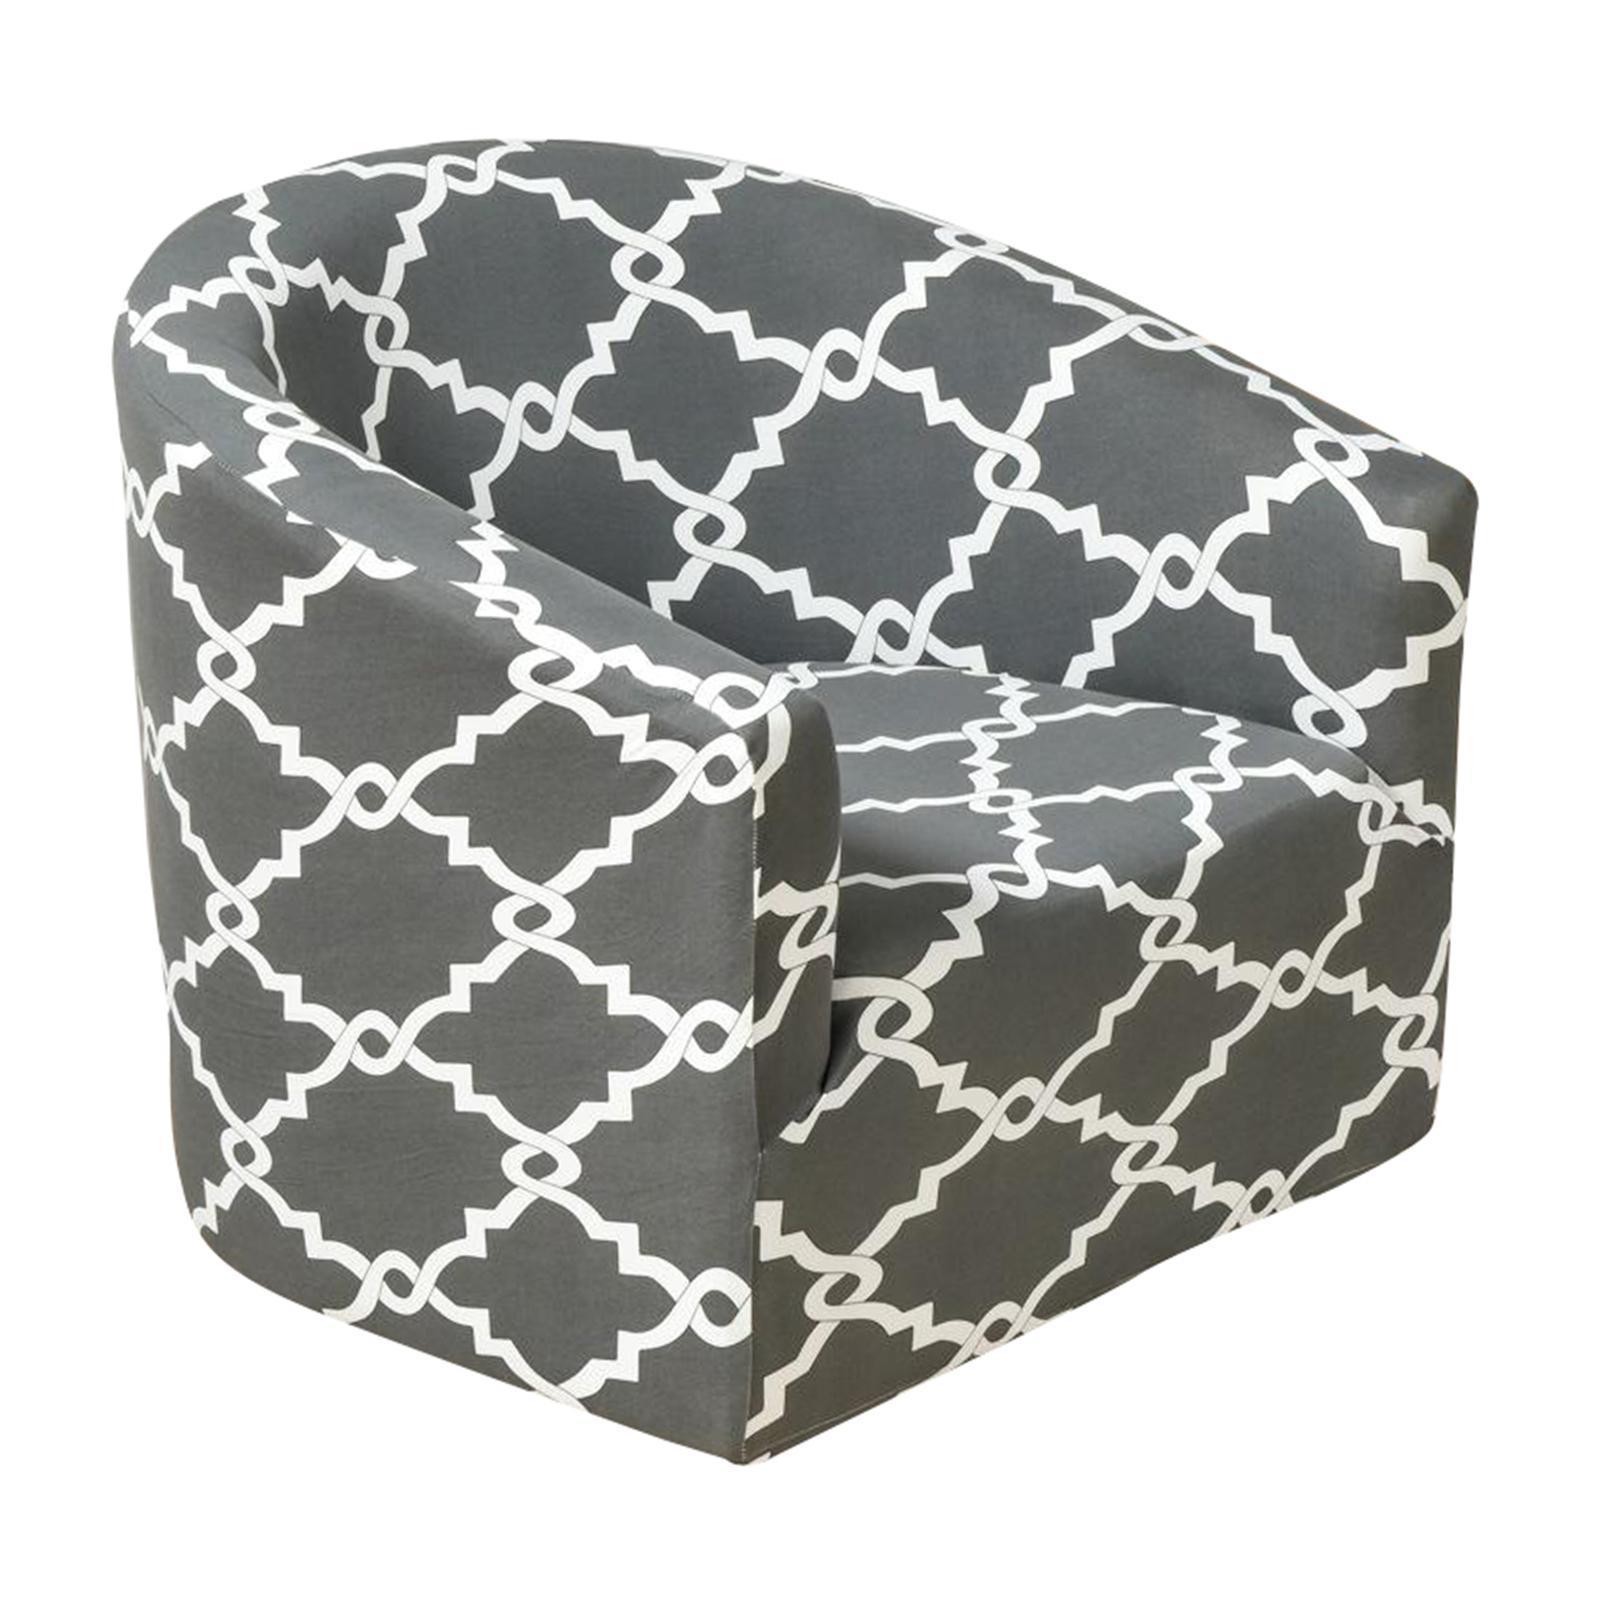 miniatura 12 - Fodera per poltrona singola per poltrona Fodera per sedia in colori assortiti